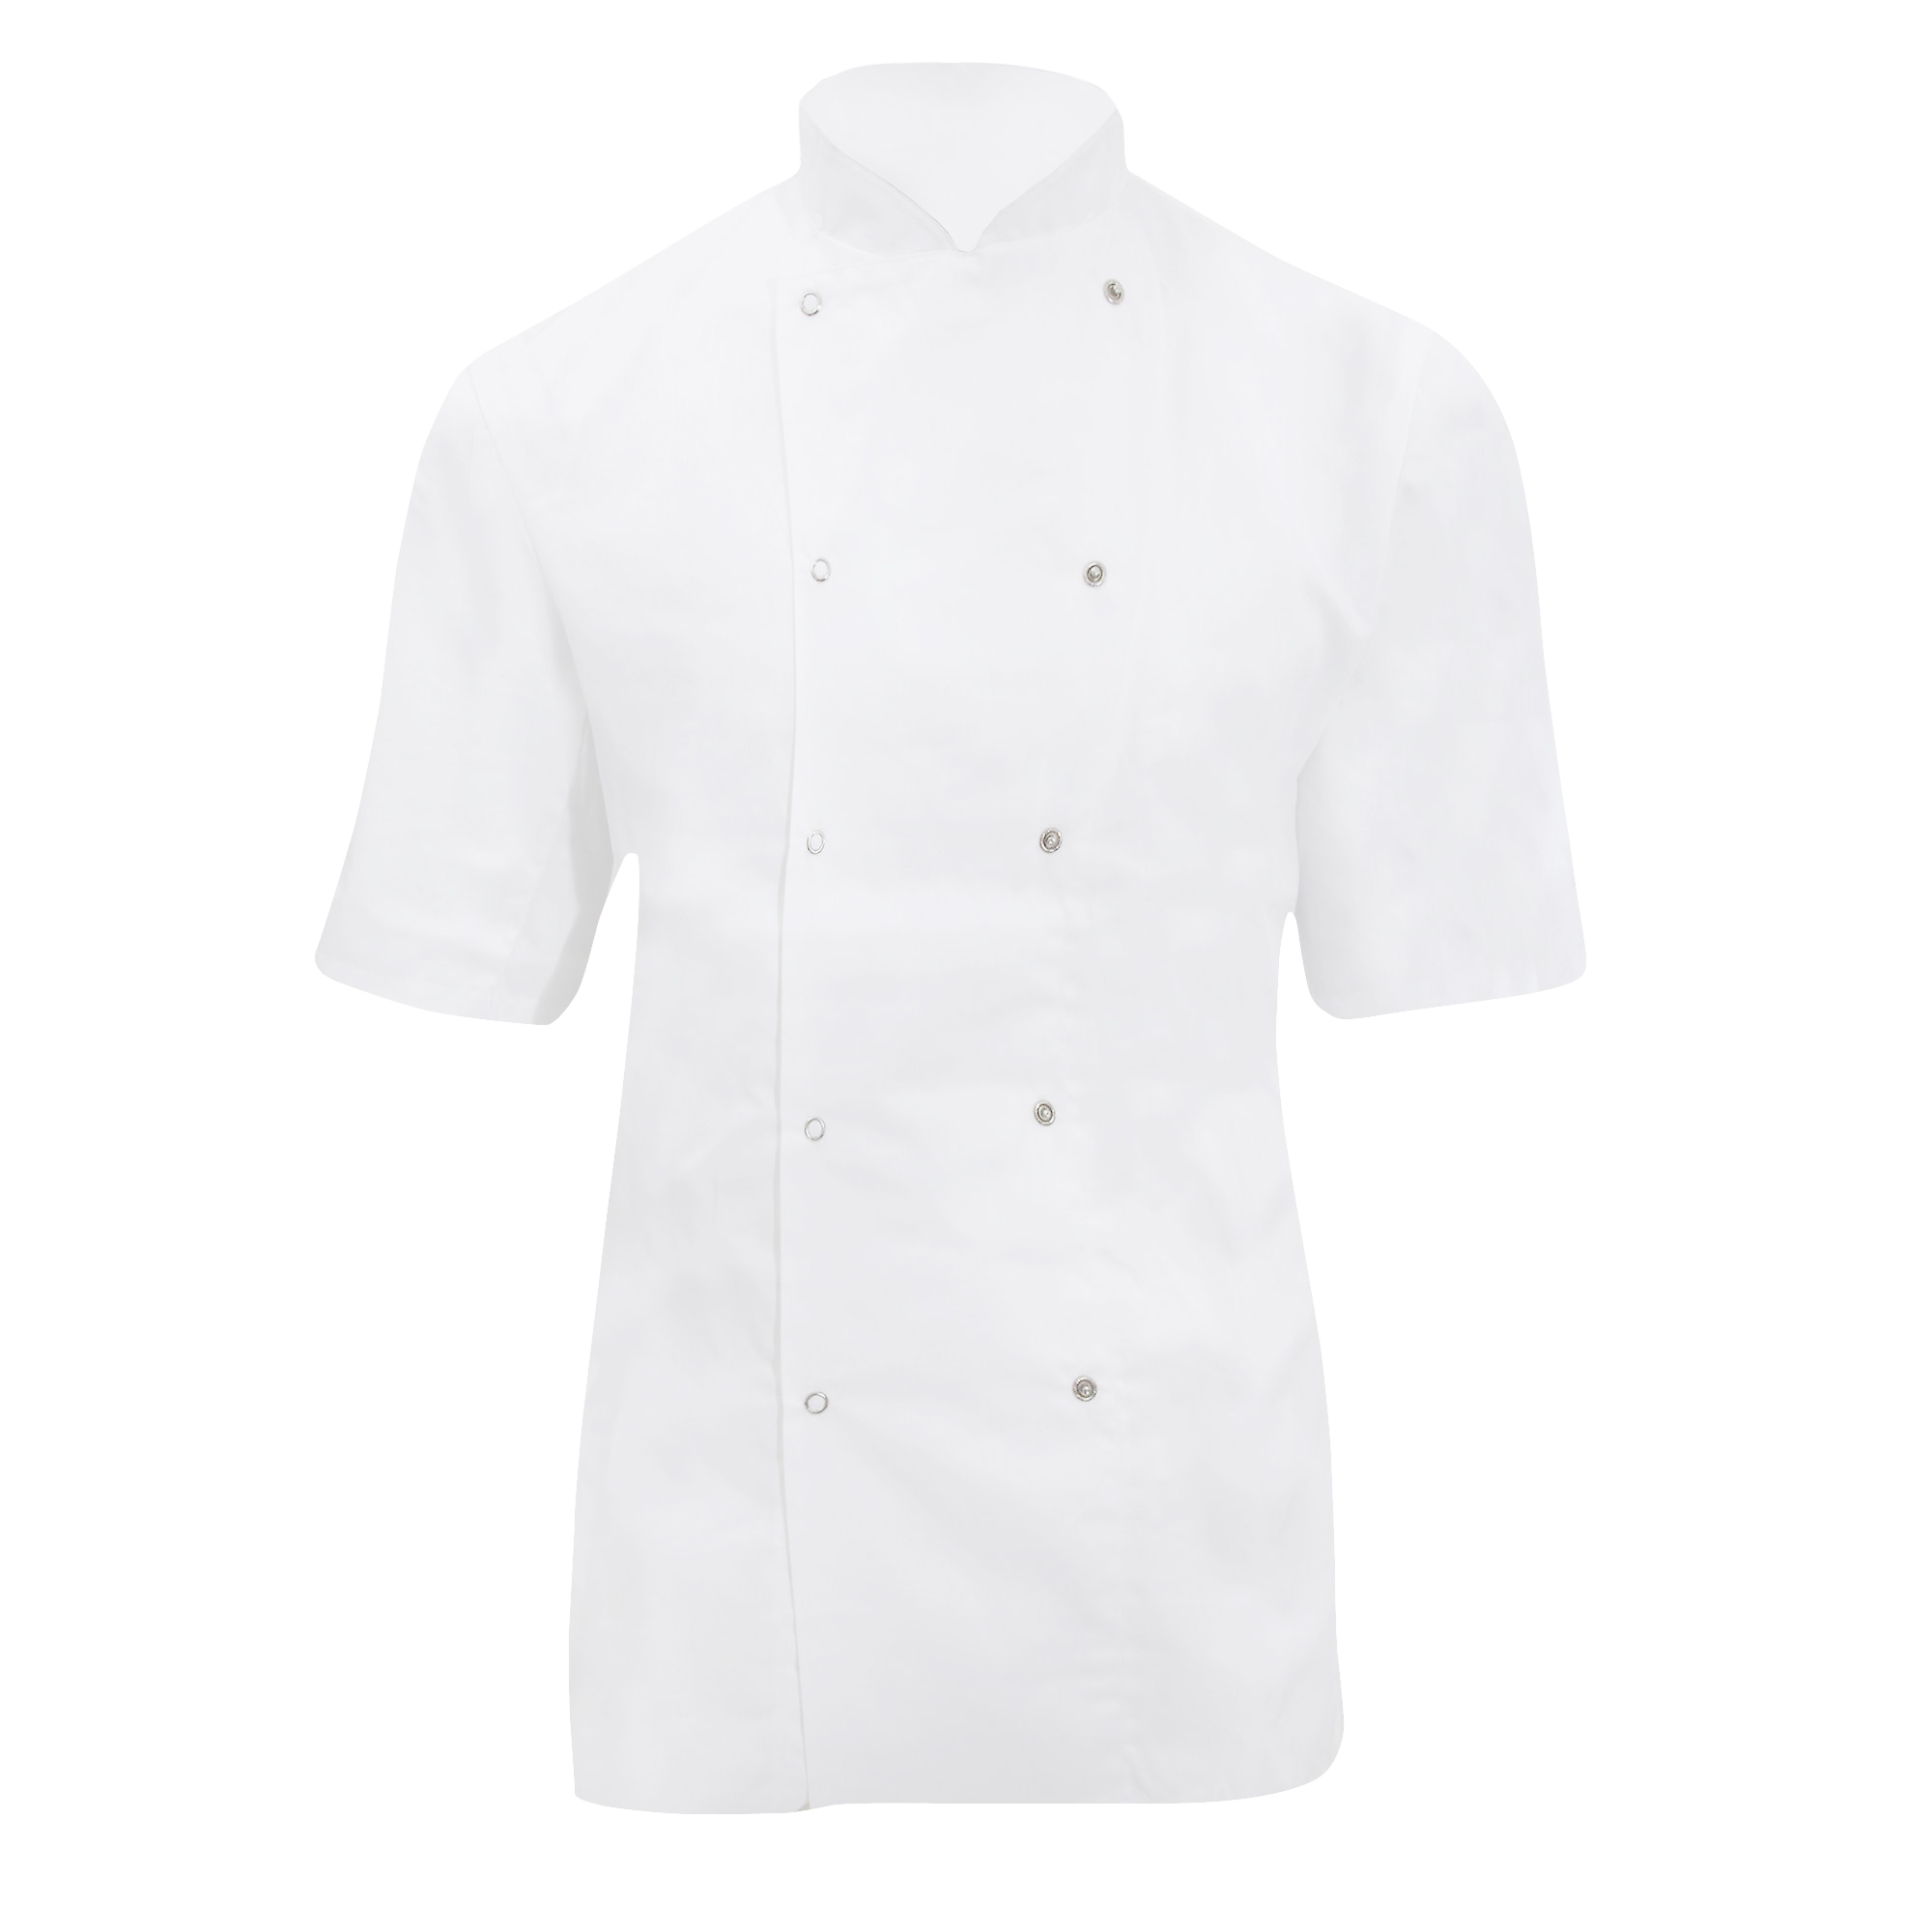 Dennys Ladies/Womens Short Sleeve Chefs Jacket / Chefswear (Pack of 2) (L) (White)